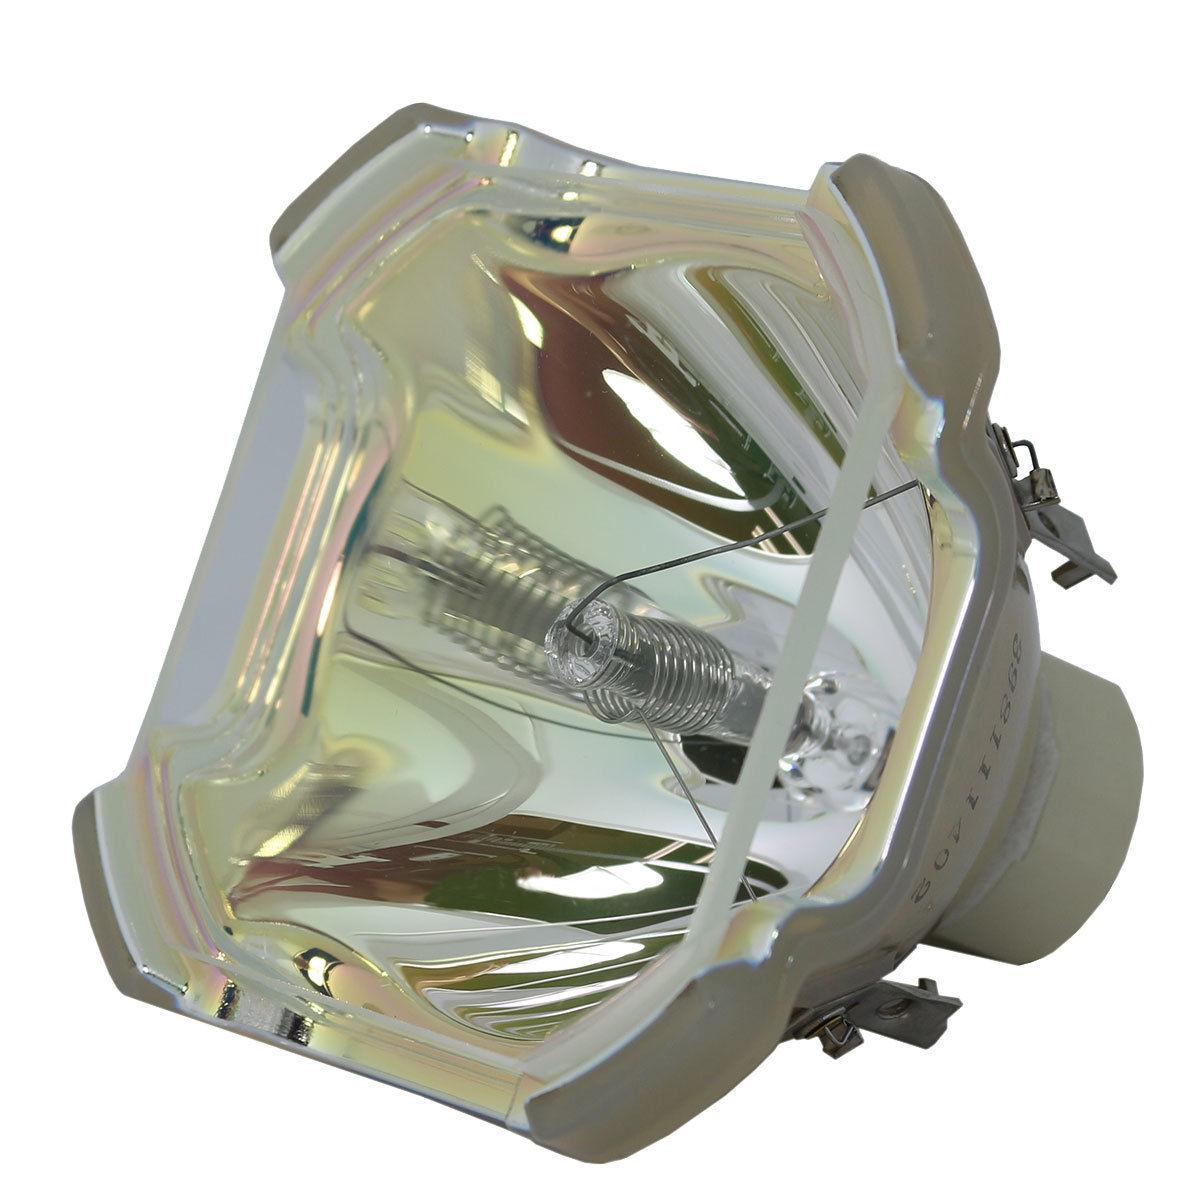 Compatible Bare Bulb POA-LMP104 LMP104 610-337-0262 for SANYO PLV-WF20 PLC-XF70 PLC-WF20 LC-X7 LC-W5 LW600 Projector Lamp Bulb projector lamp bulb poa lmp104 poalmp104 lmp104 610 337 0262 for sanyo plc wf20 plc xf70 plv wf20 with housing